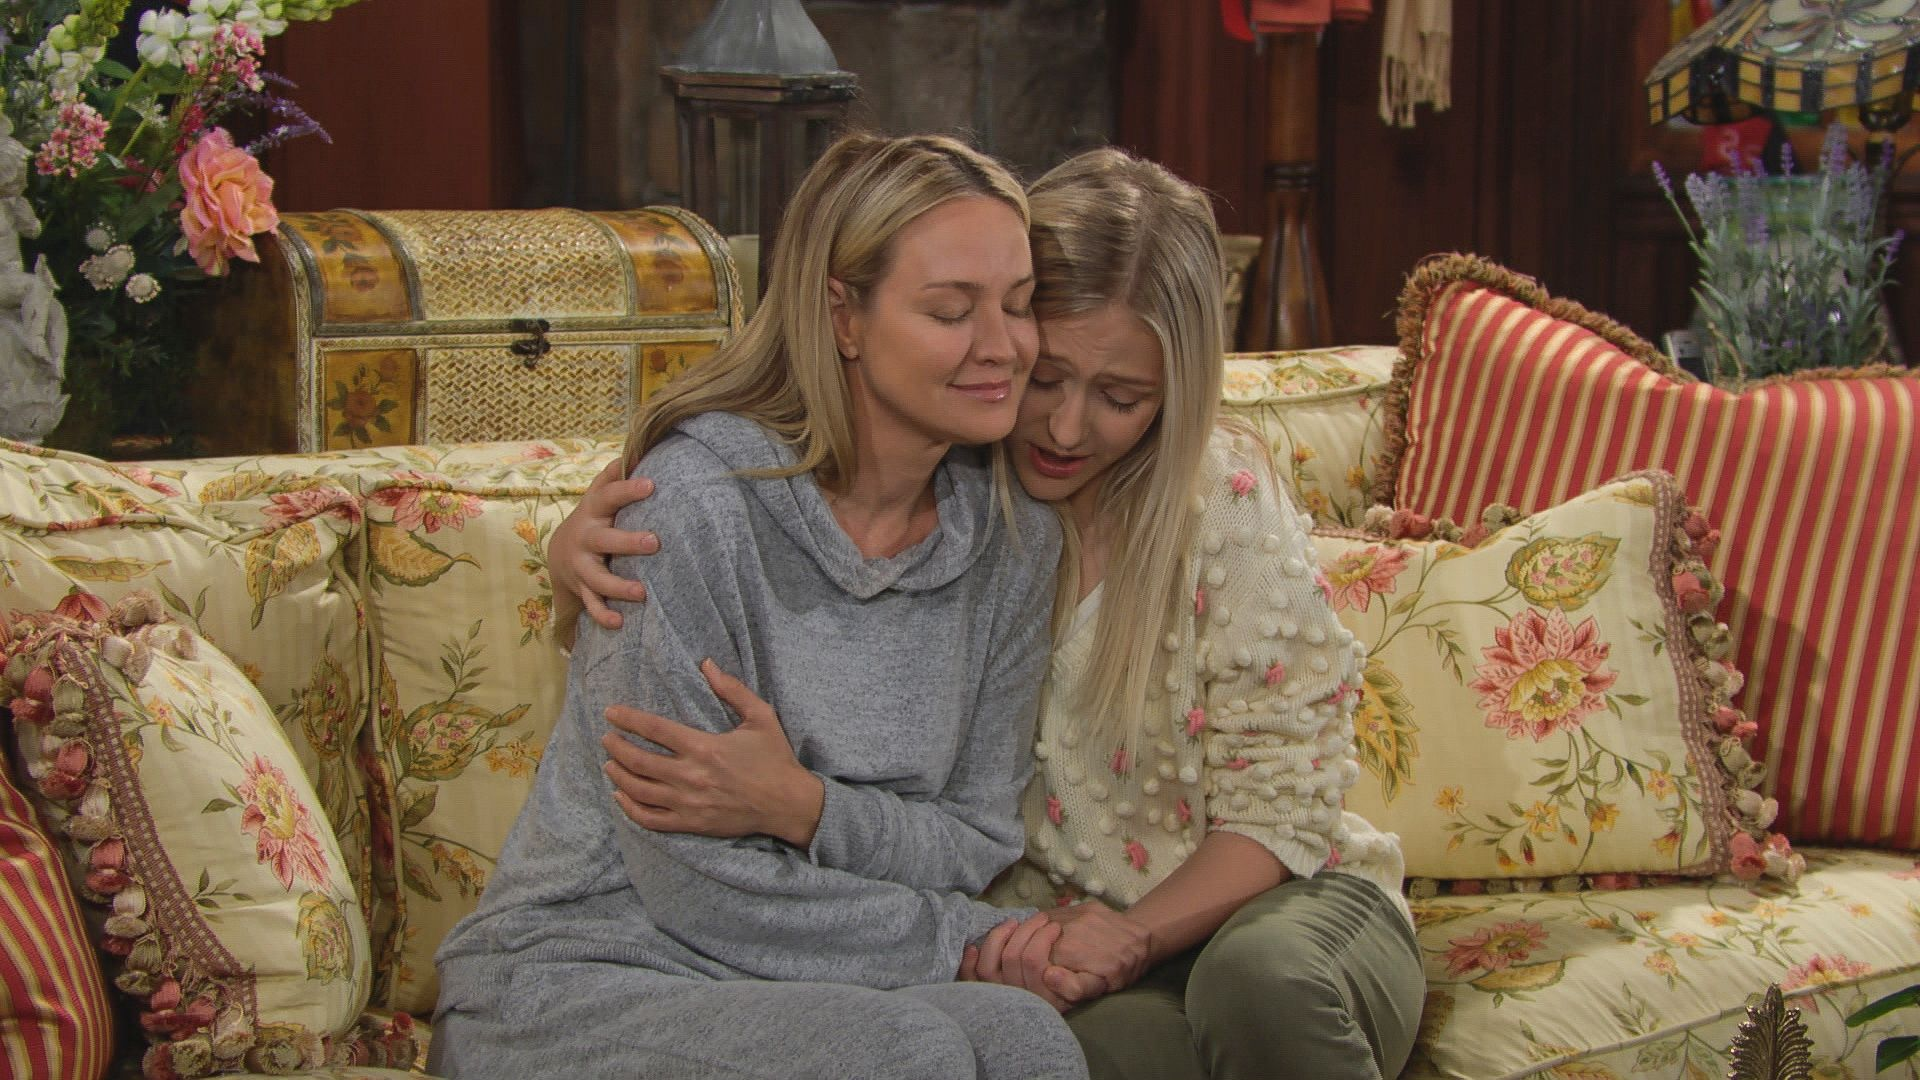 Alyvia Alyn Lind as Faith wraps comforting arm around Sharon Case as Sharon